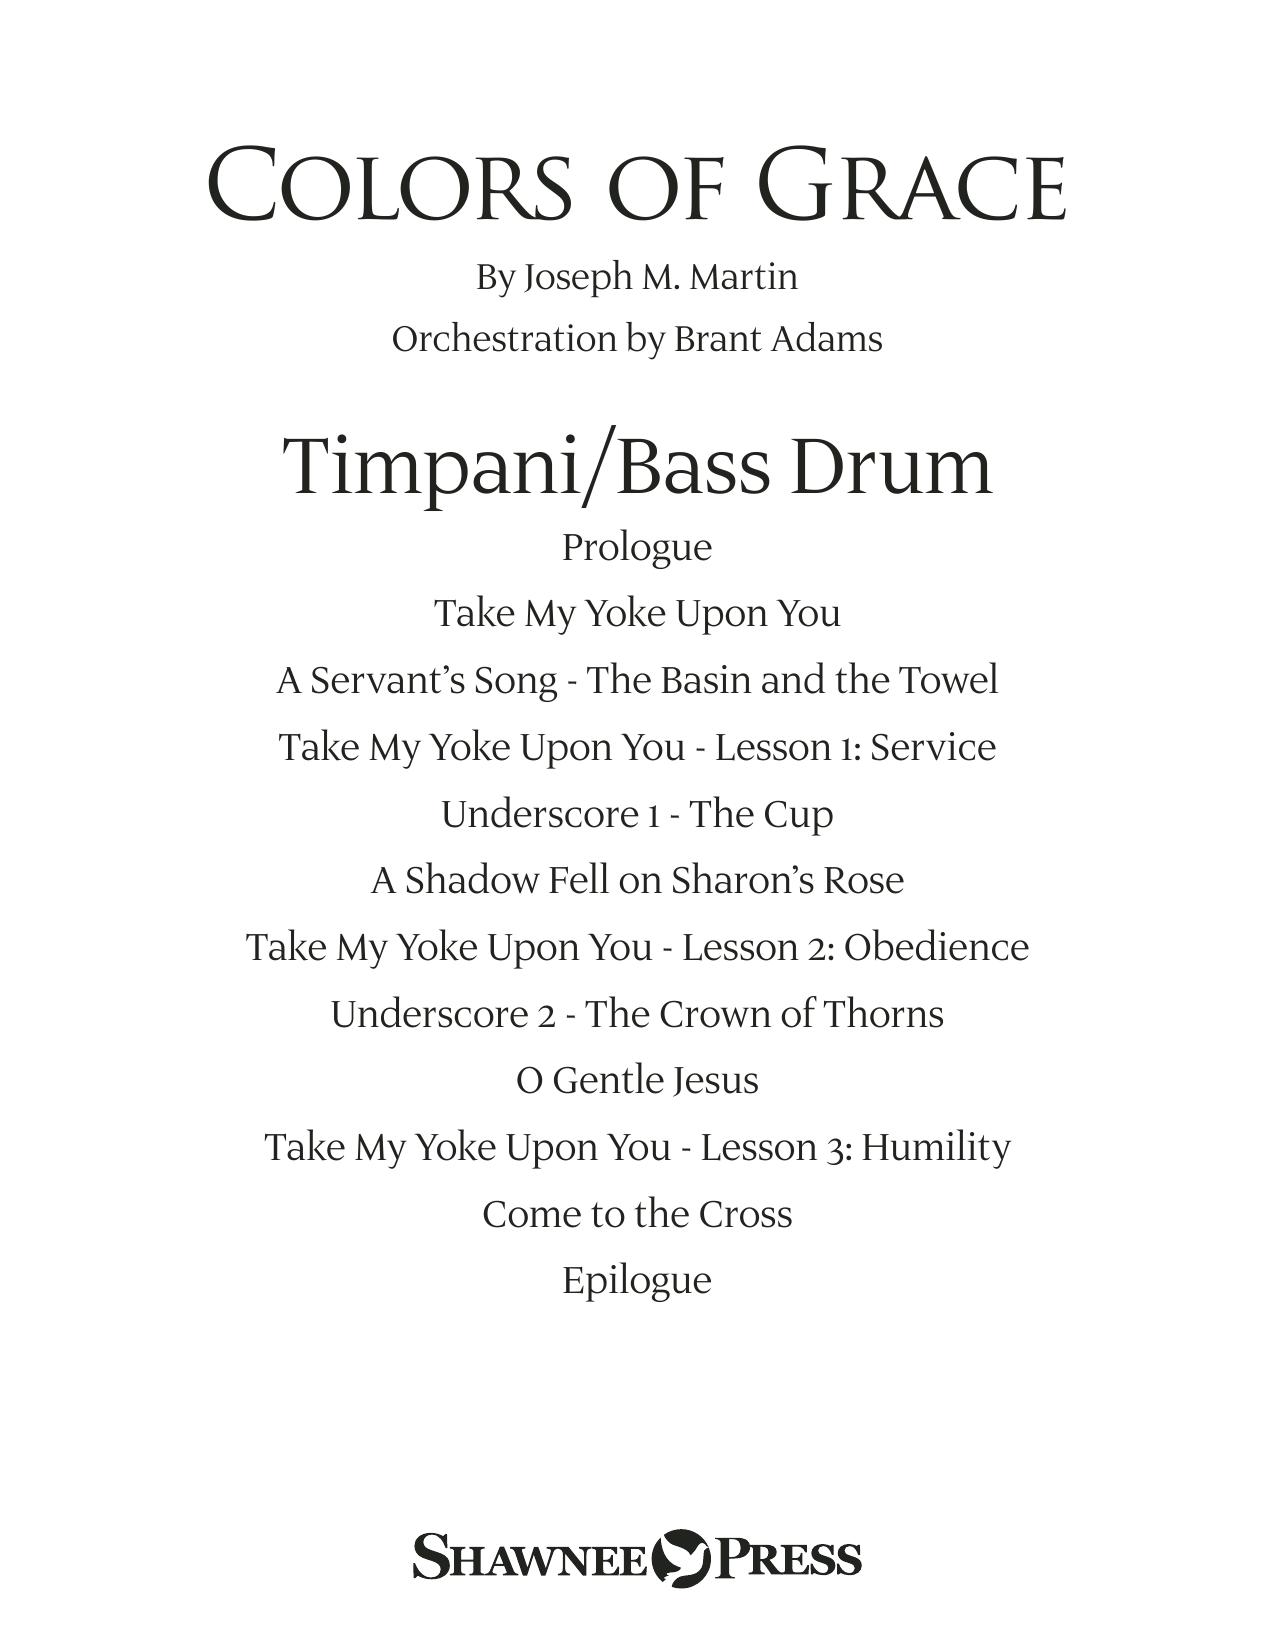 Colors of Grace - Lessons for Lent (New Edition) (Orchestra Accompaniment) - Timpani (Choir Instrumental Pak)